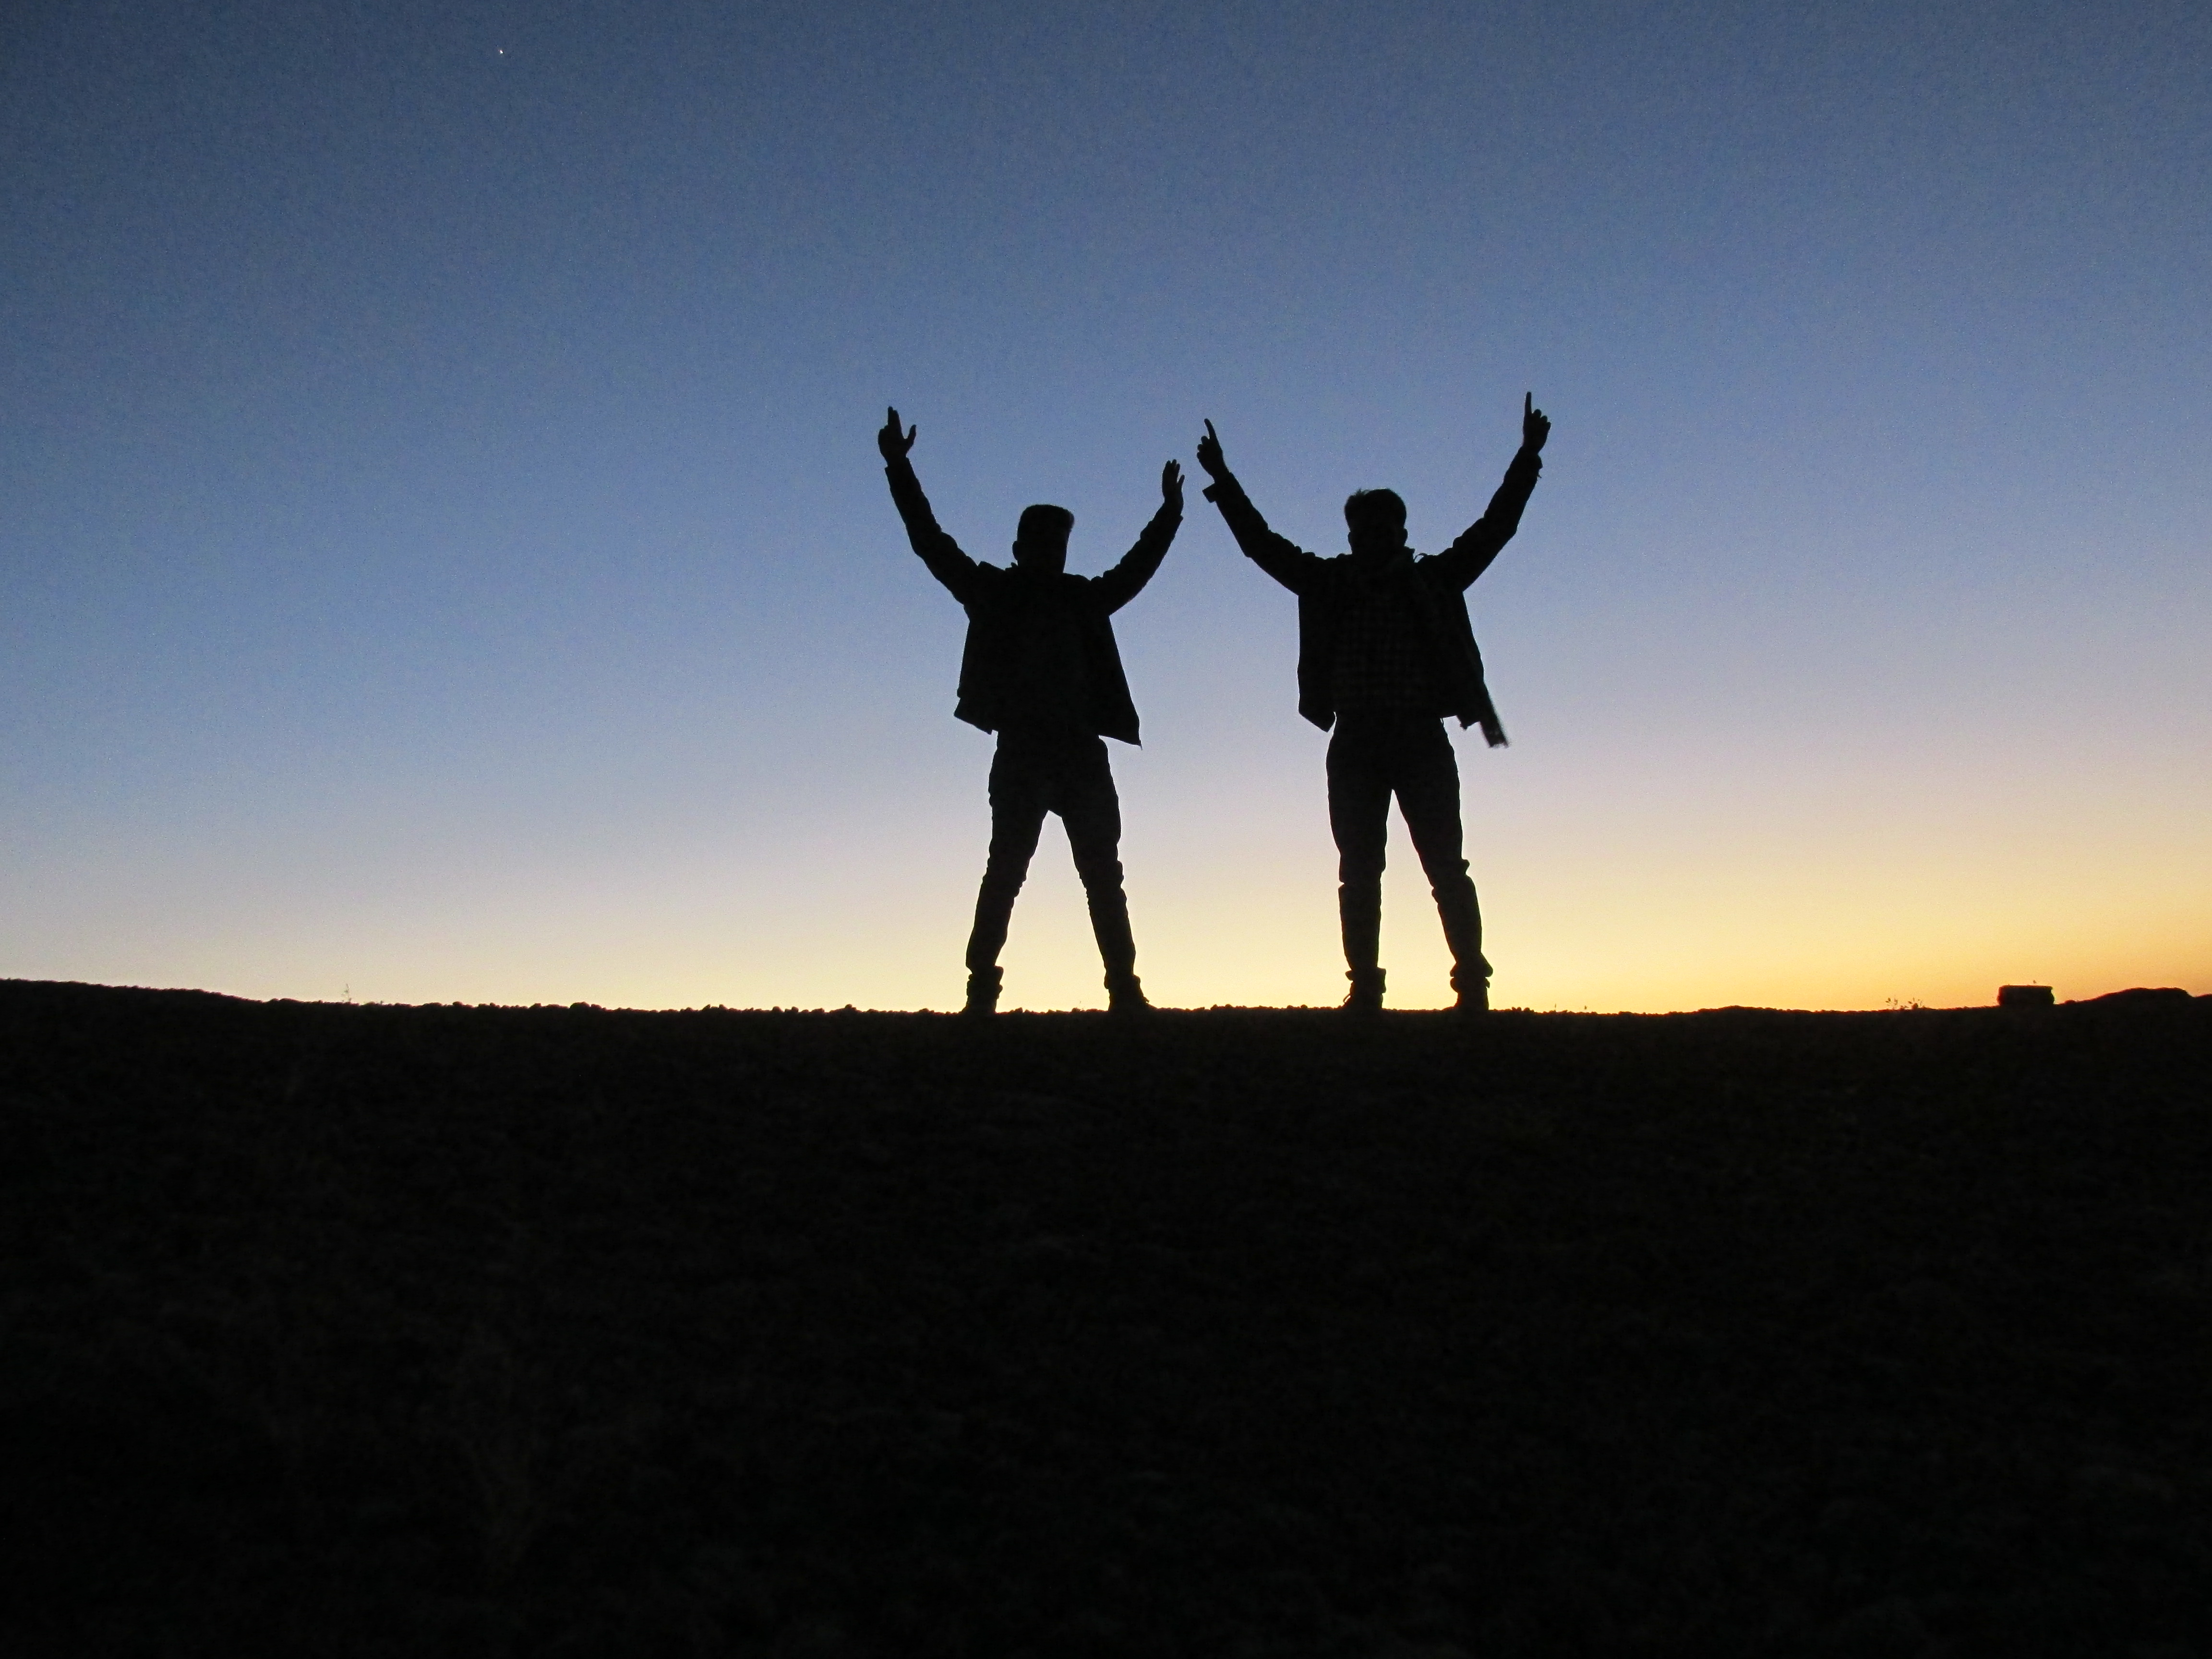 File:Two friends adventure.jpg - Wikimedia Commons